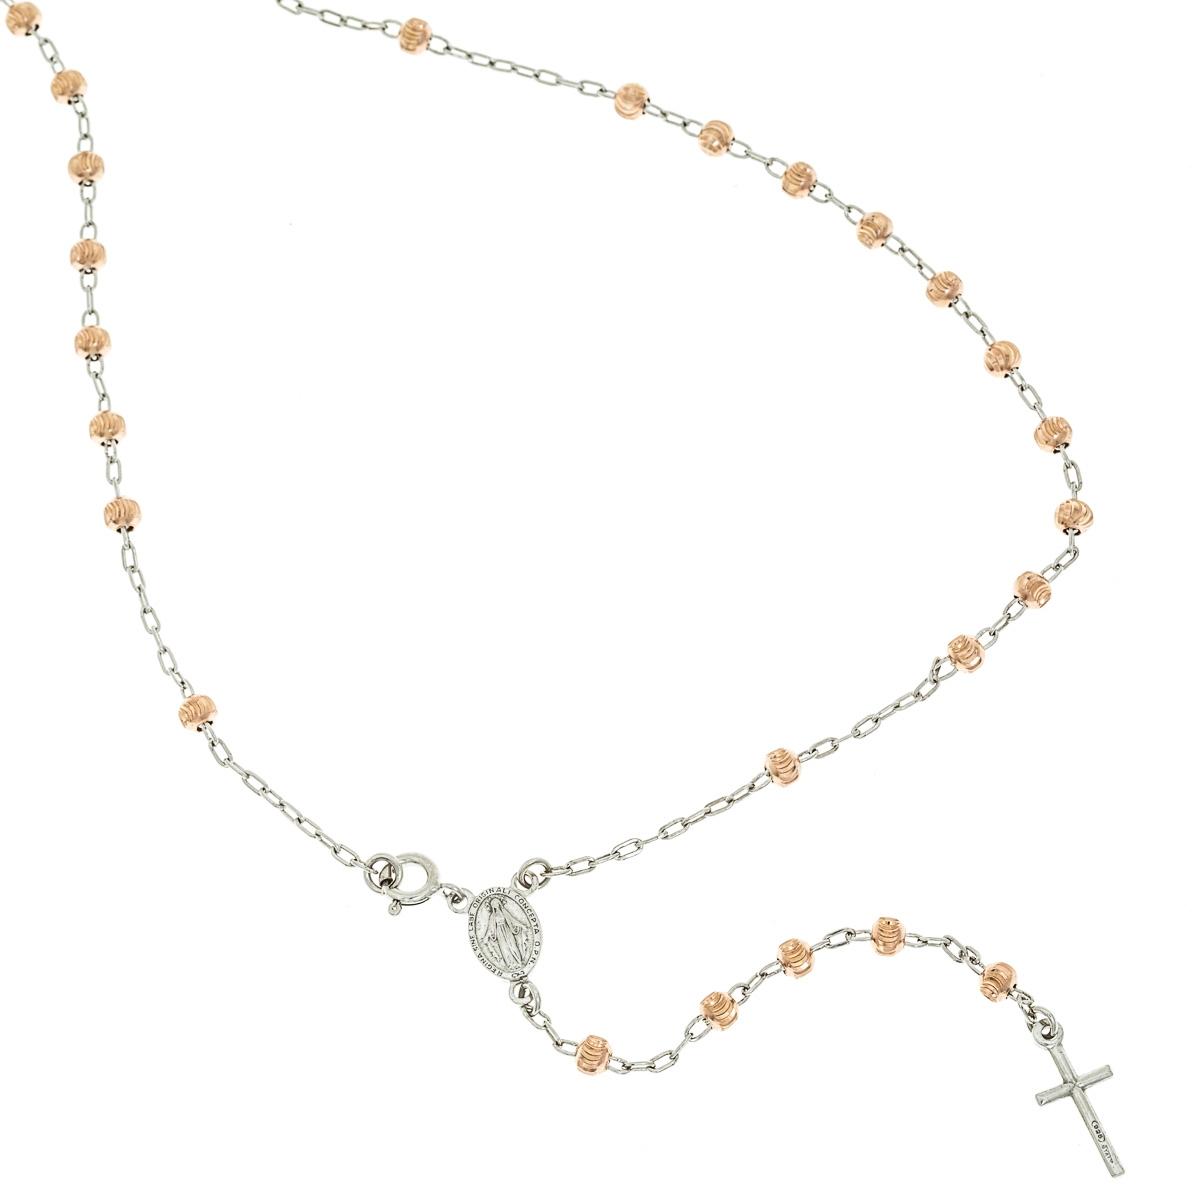 Ellebi Catene Silver Chains And Jewelry